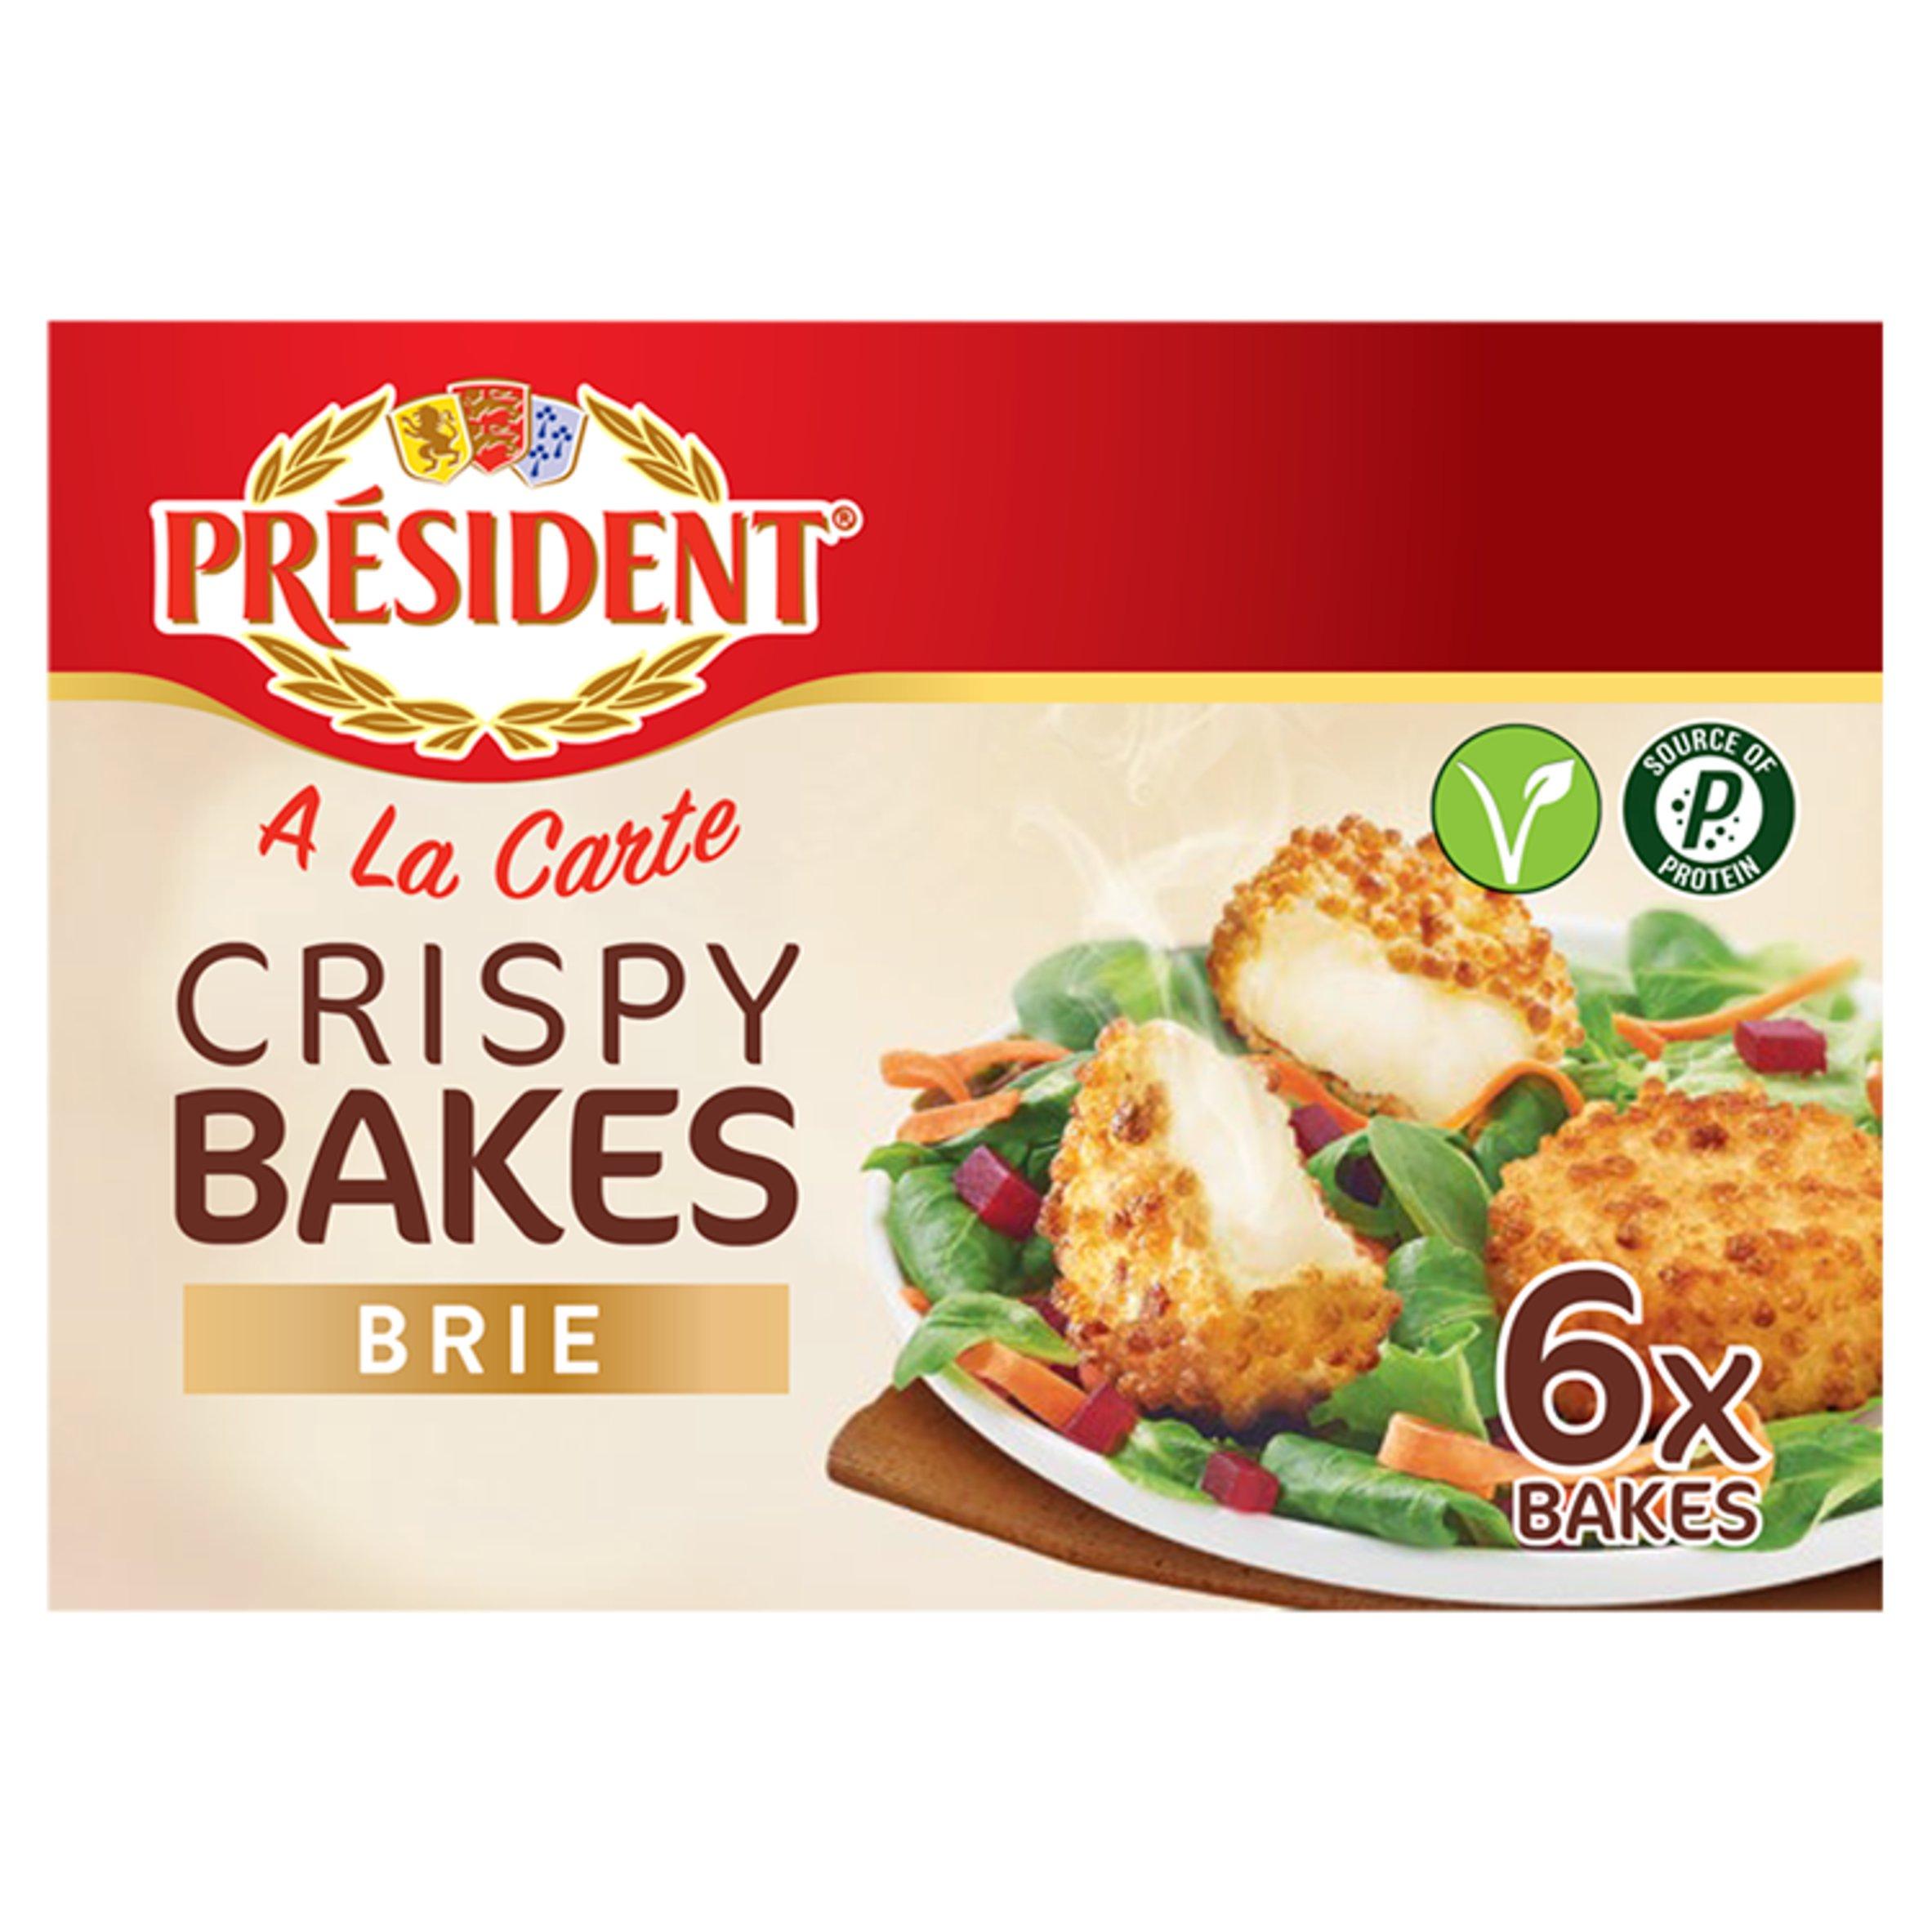 President A La Carte Crispy Bake With Brie 6X25g